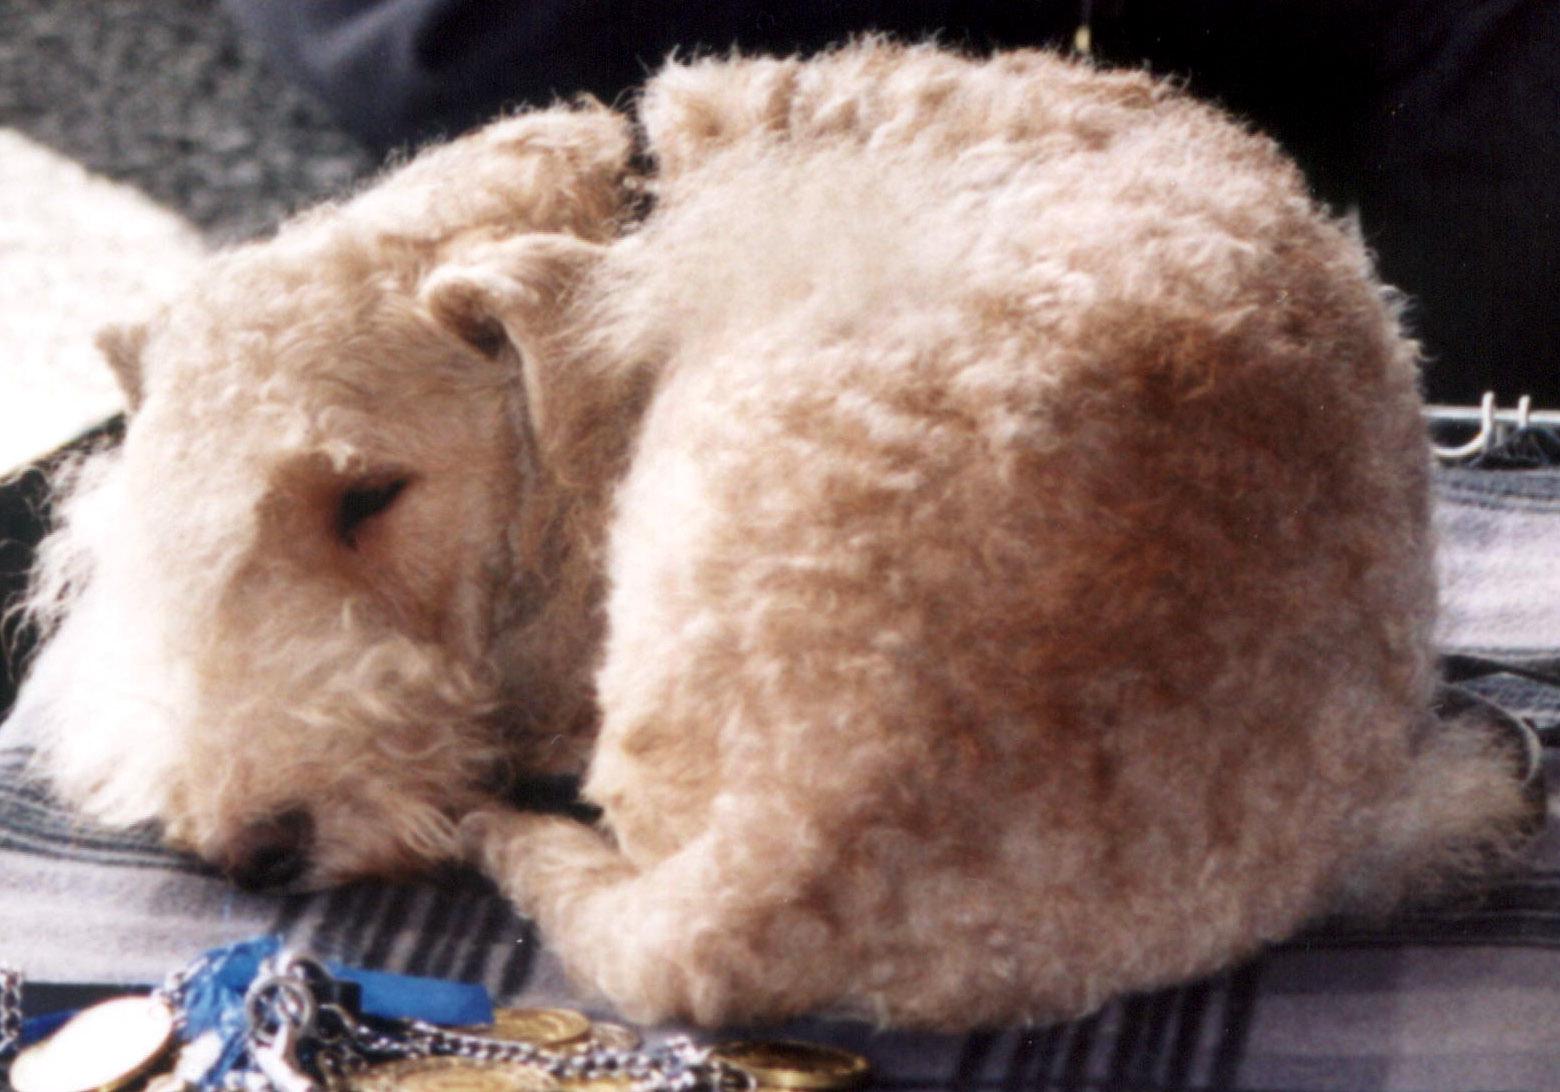 Sleeping Lakeland Terrier dog wallpaper